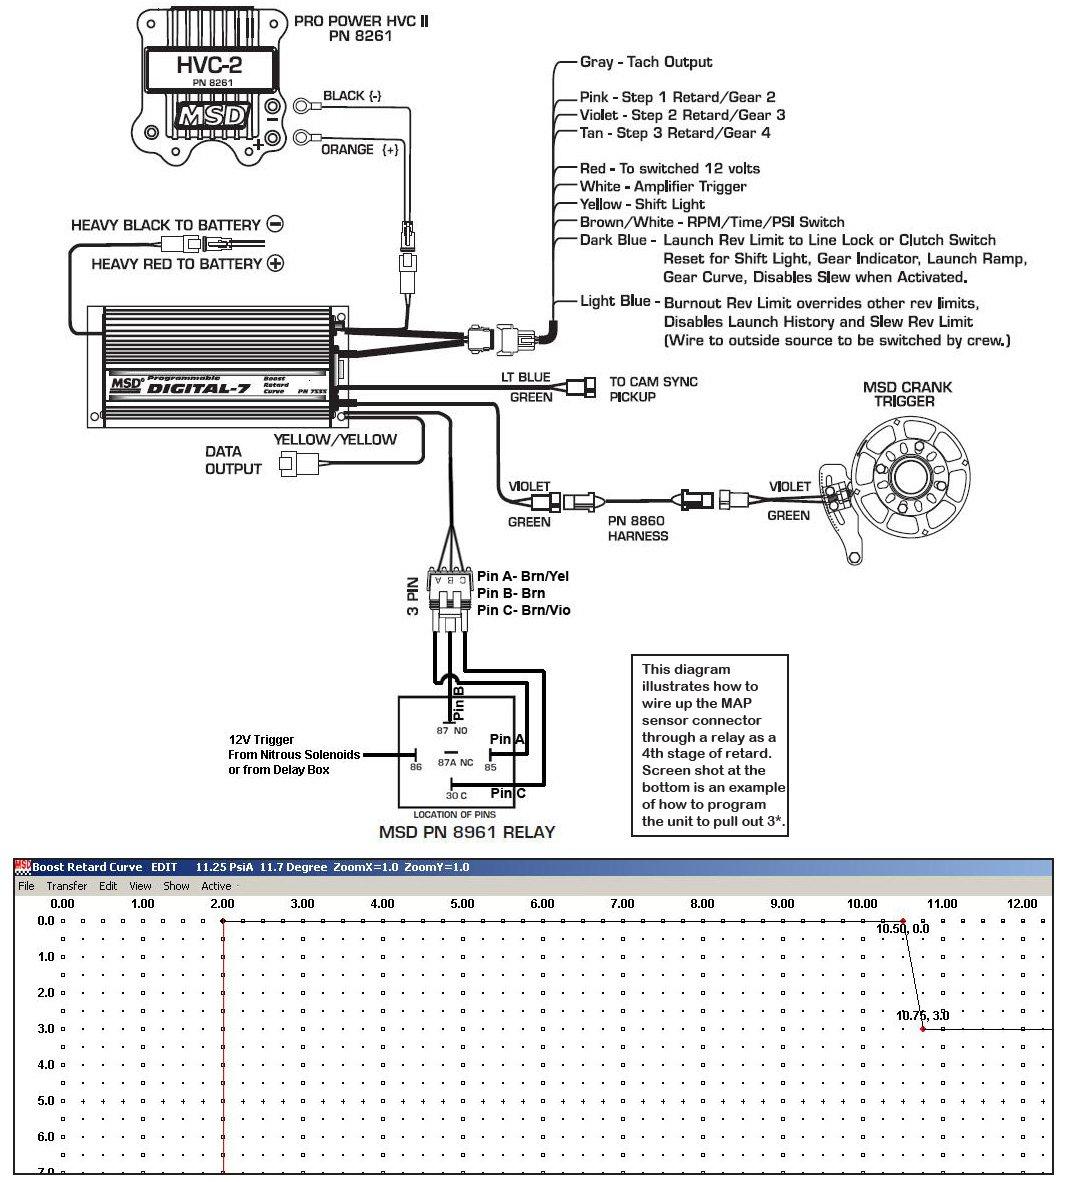 blog_diagrams_and_drawings_digital_7_drawings_7531_4th_stage_retard_map_4th_stage_retard_reva?resize\=665%2C738\&ssl\=1 msd 7al 2 wiring diagram chevy ignition msd 7al2 for sale \u2022 45 63 msd 7al-2 wiring diagram 7220 at panicattacktreatment.co